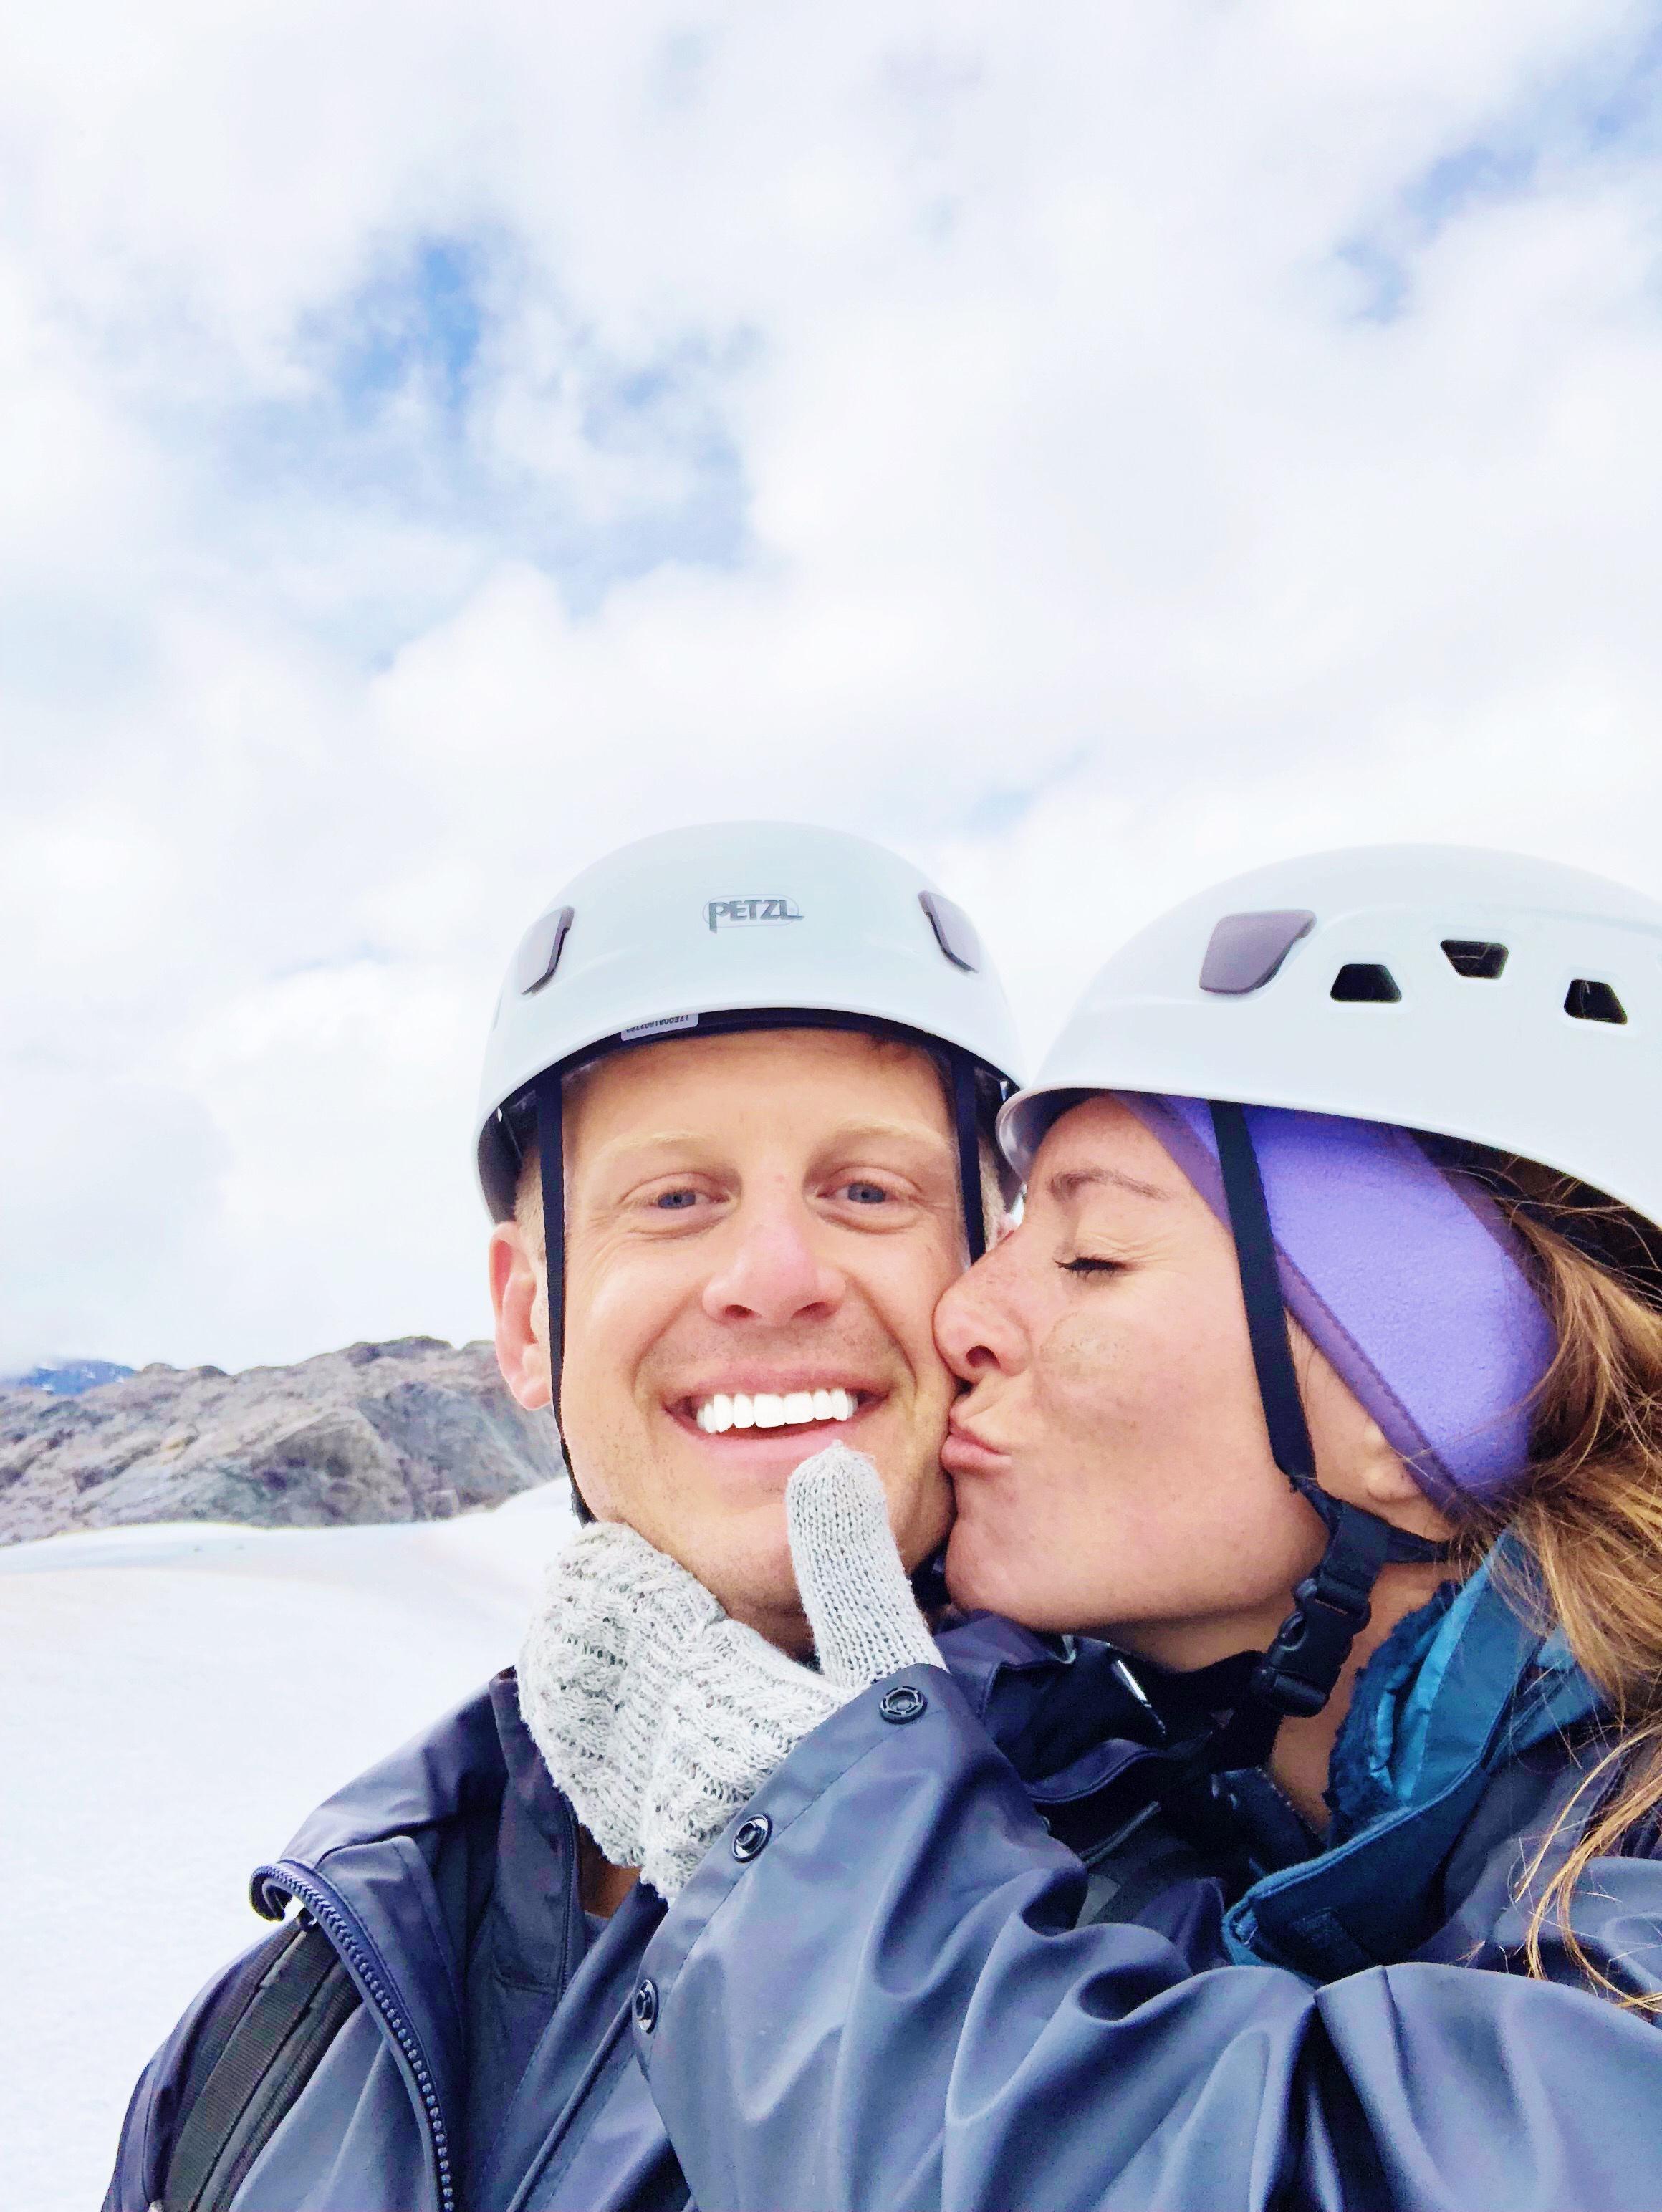 Our Experience Trekking Mendenhall Glacier - Communikait by Kait Hanson #juneau #alaska #mendenhallglacier #glaciers #alaskacruise